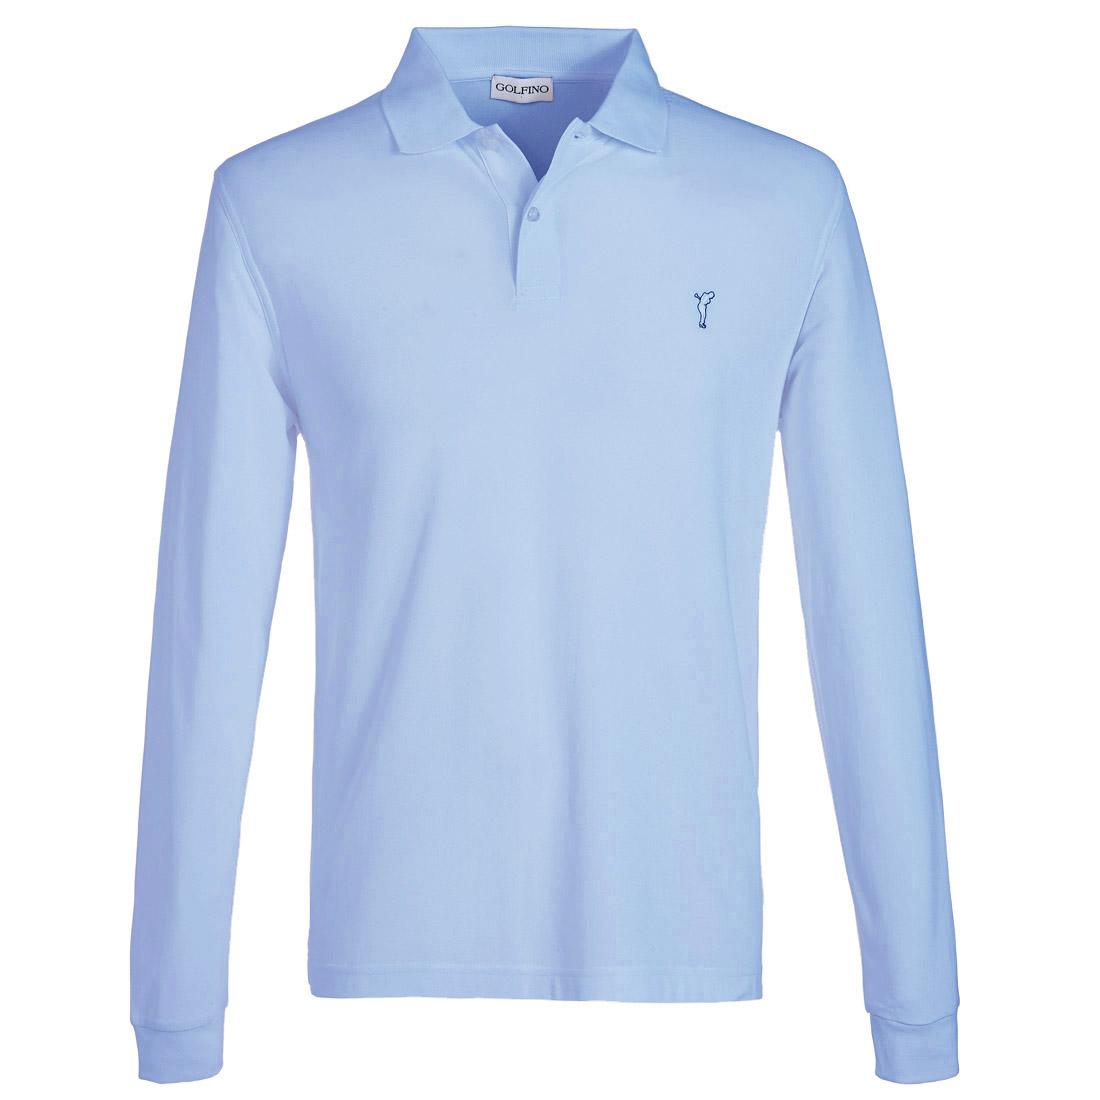 Extra Dry Herbst Poloshirt gebürstet